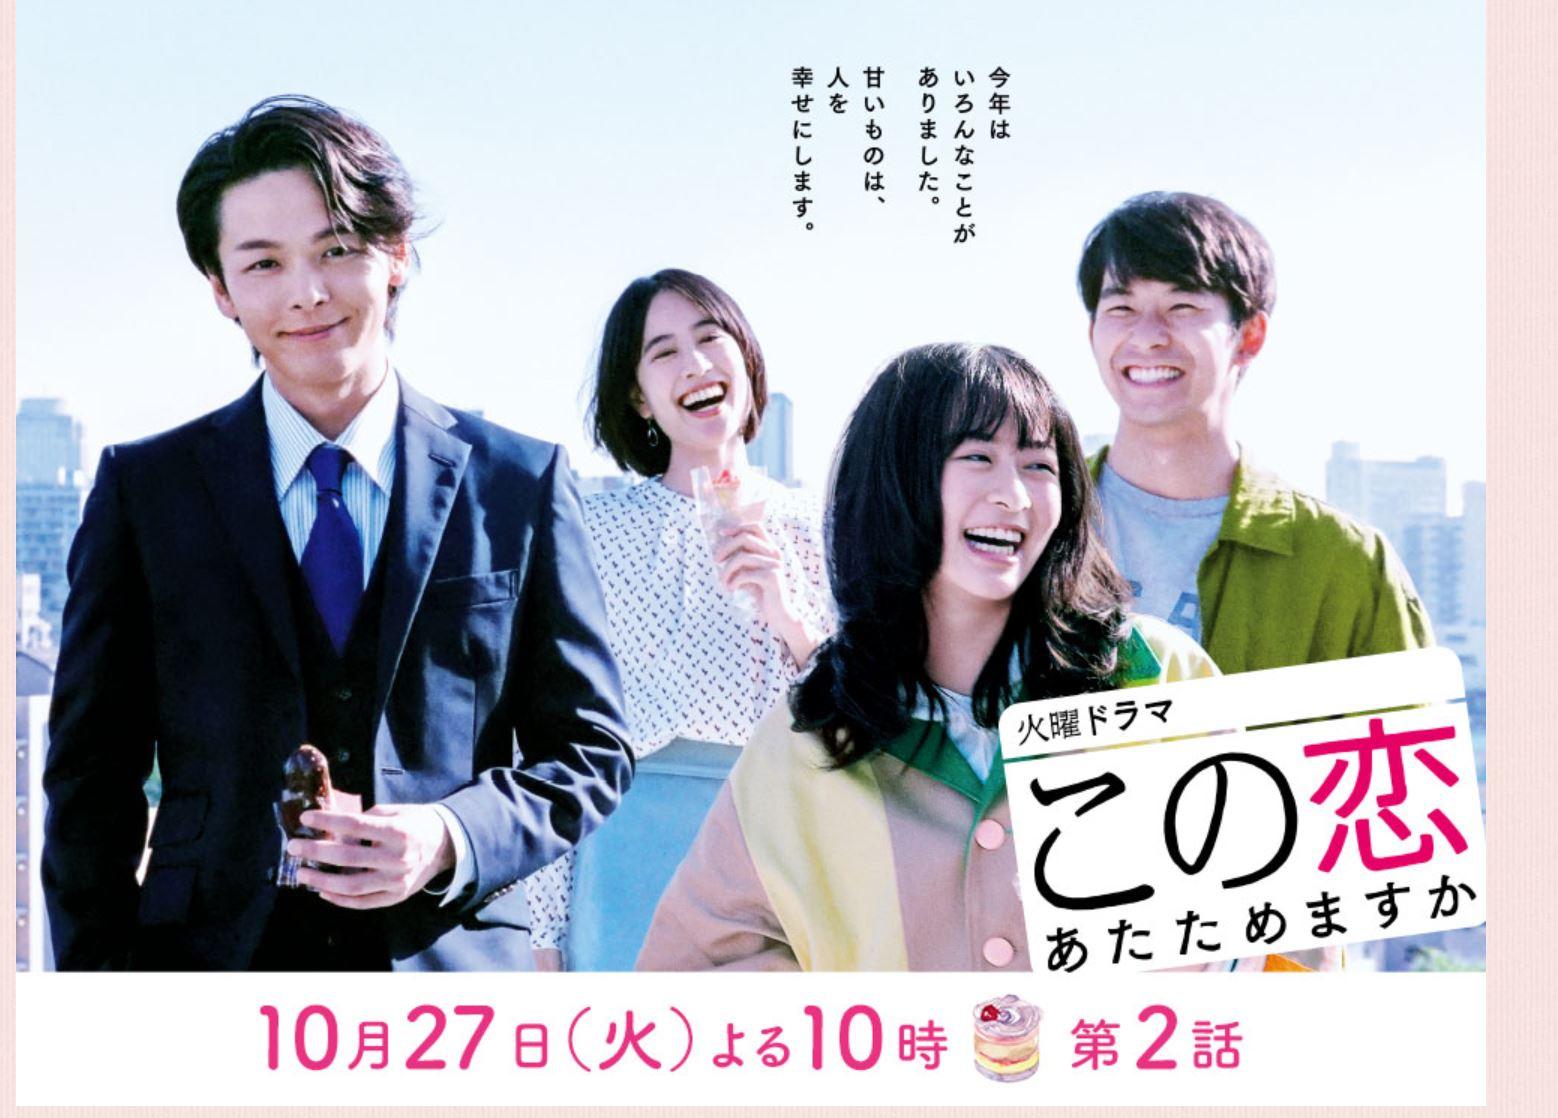 Cm 松井 女優 証券